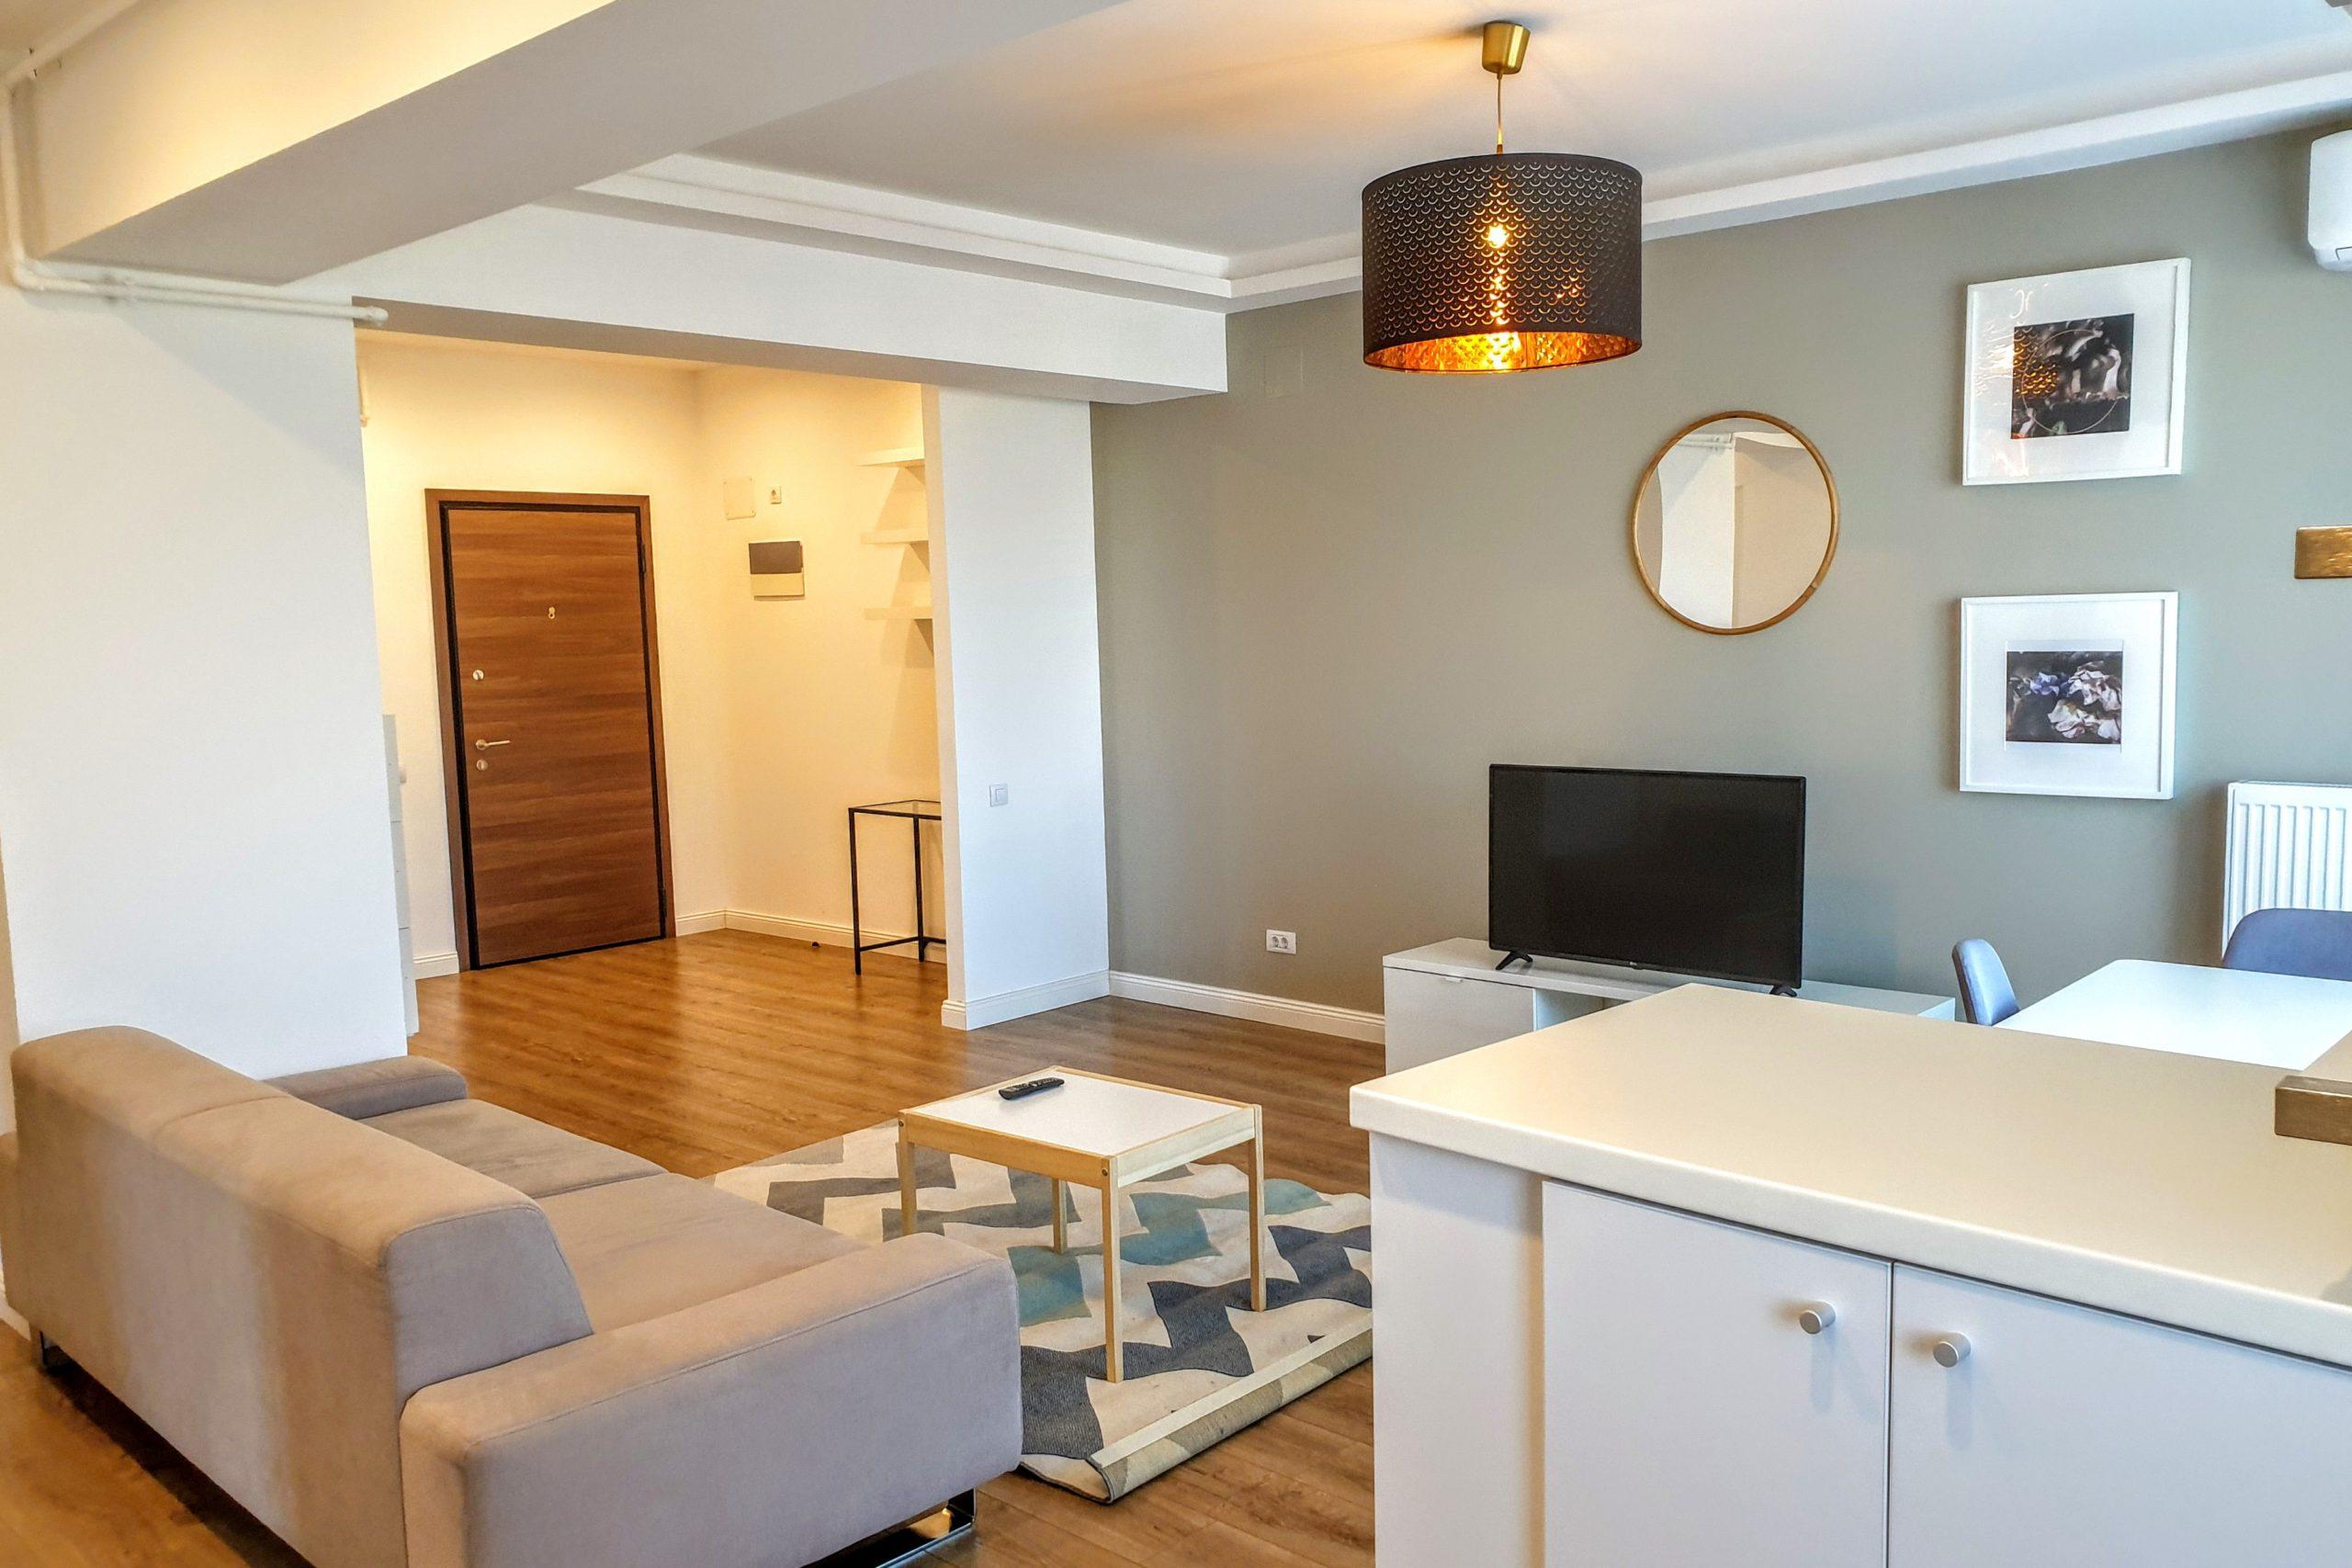 Apartament splendid, in stare impecabila – imobil nou, Aviatiei!